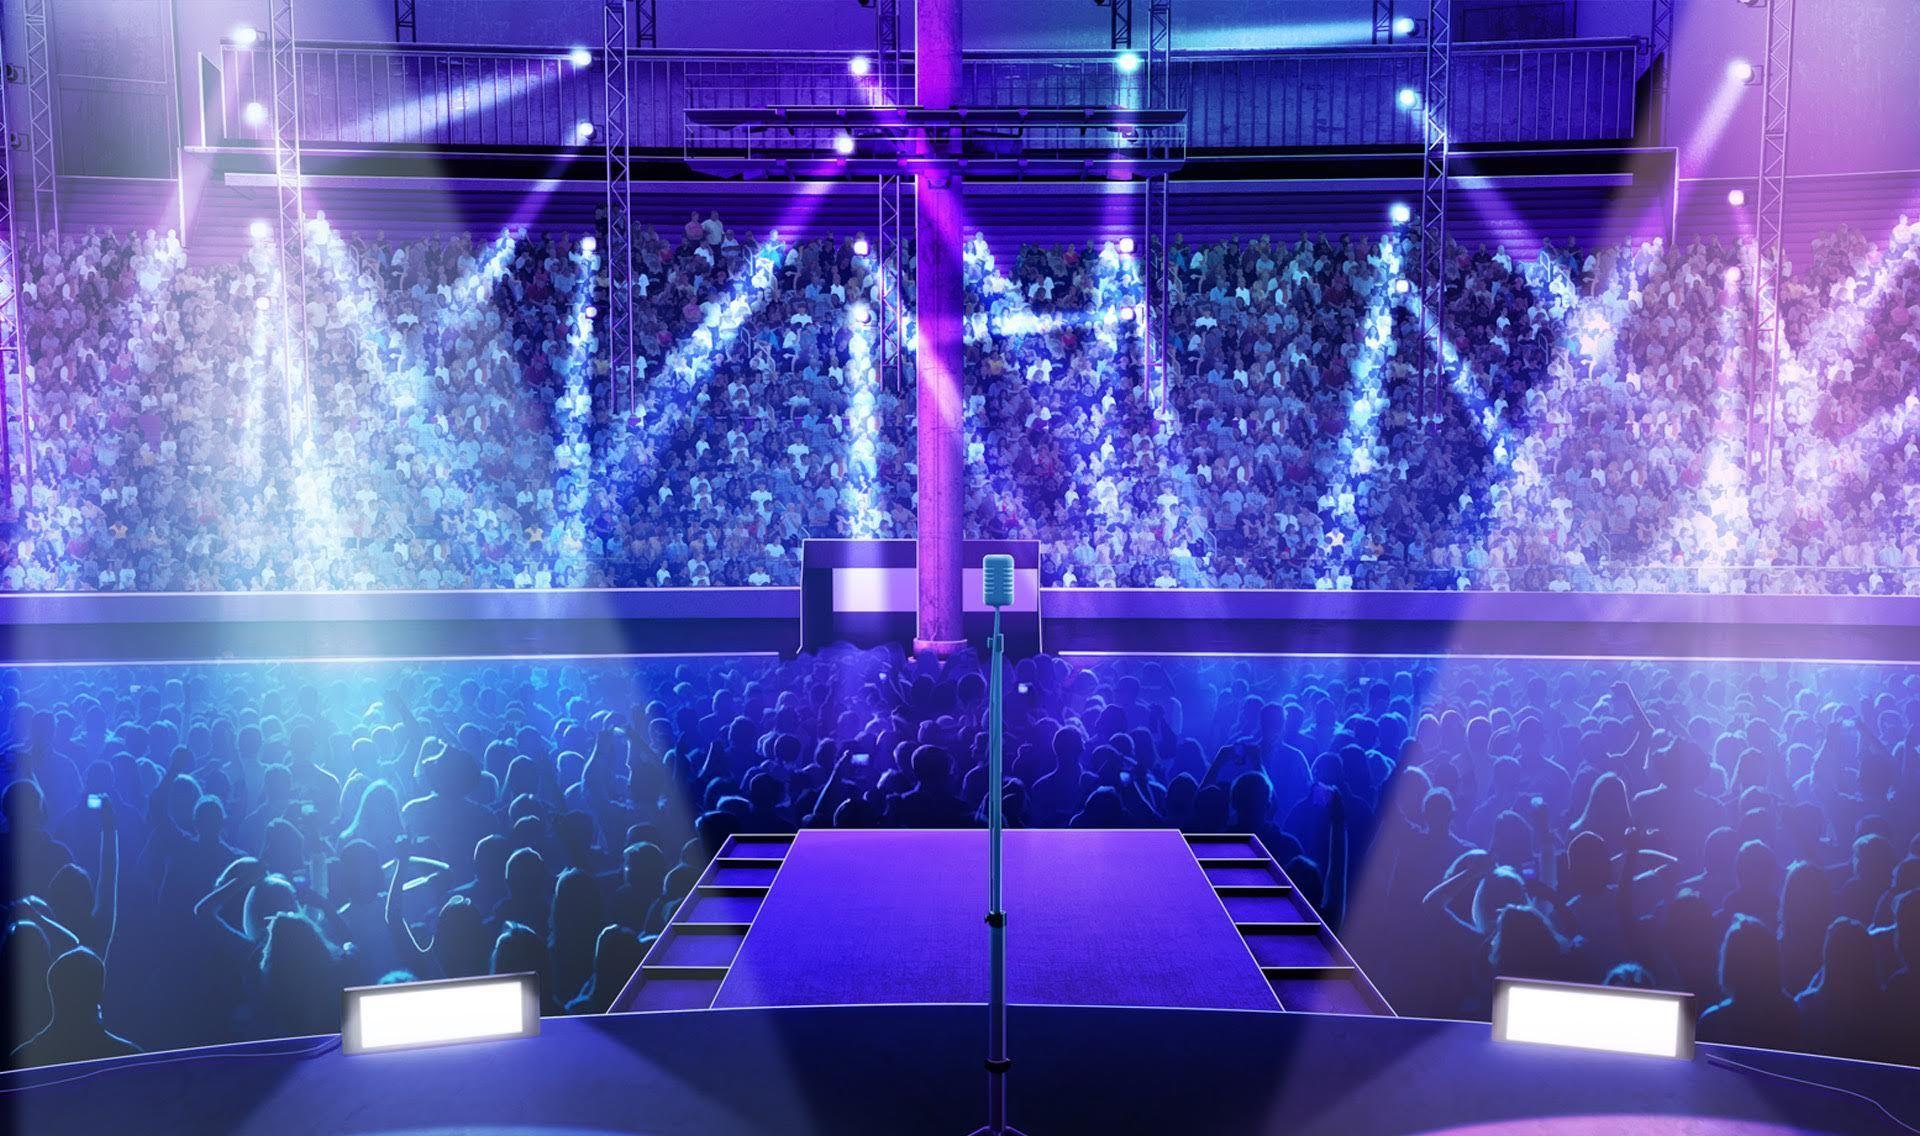 Int on rock concert stage night episode pinterest - Ozona discoteca madrid ...